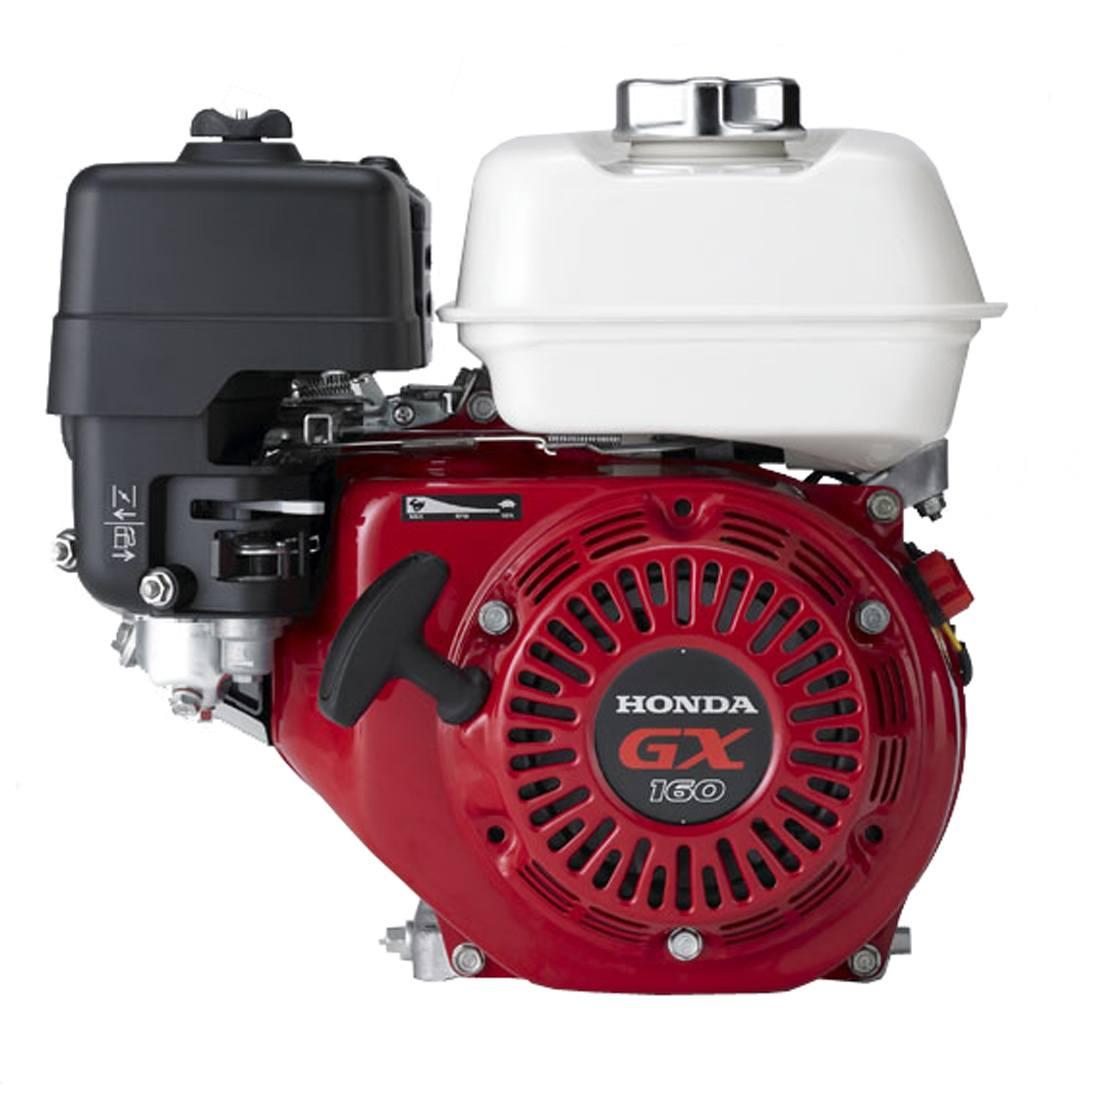 GX160H1-QX3. Двигатель бензиновый Honda GX 160 QX3